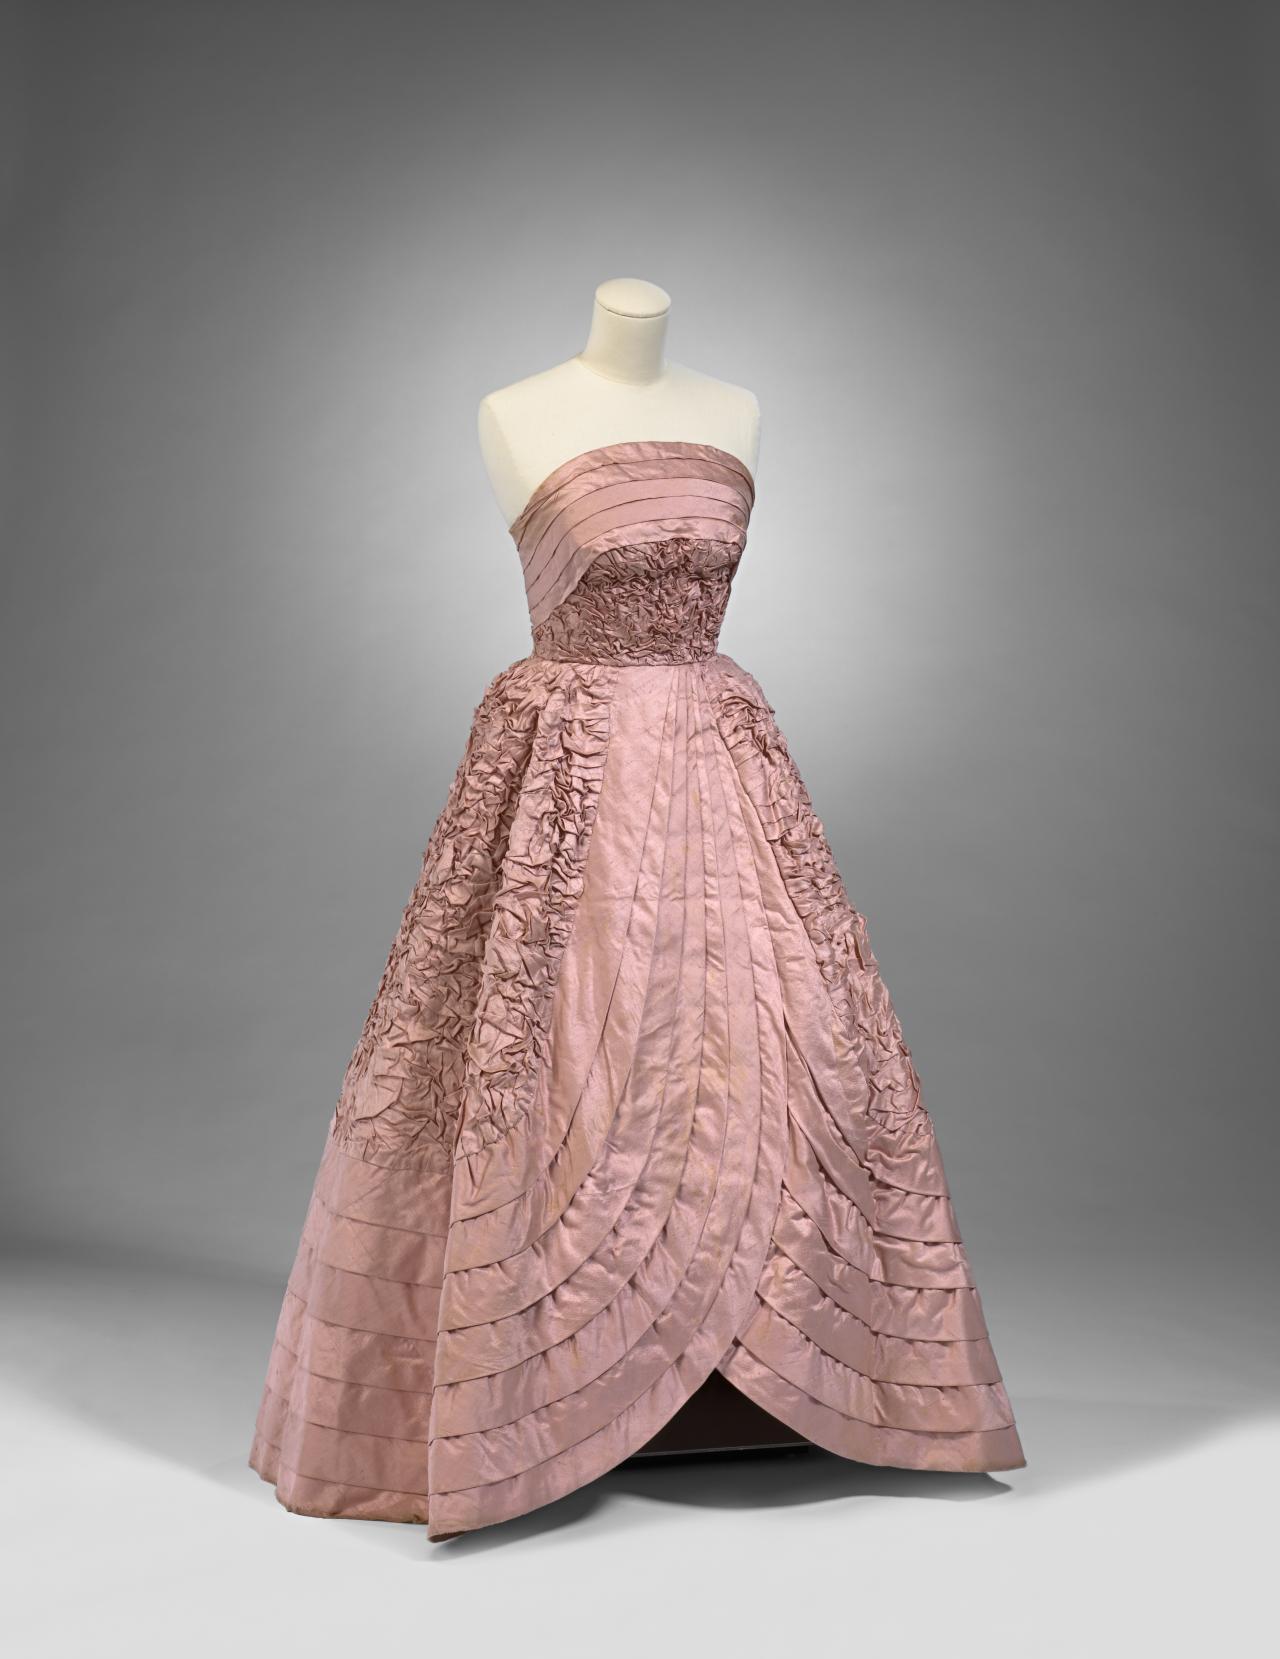 Evening gown | Hall LUDLOW (designer); HALL LUDLOW, Melbourne ...